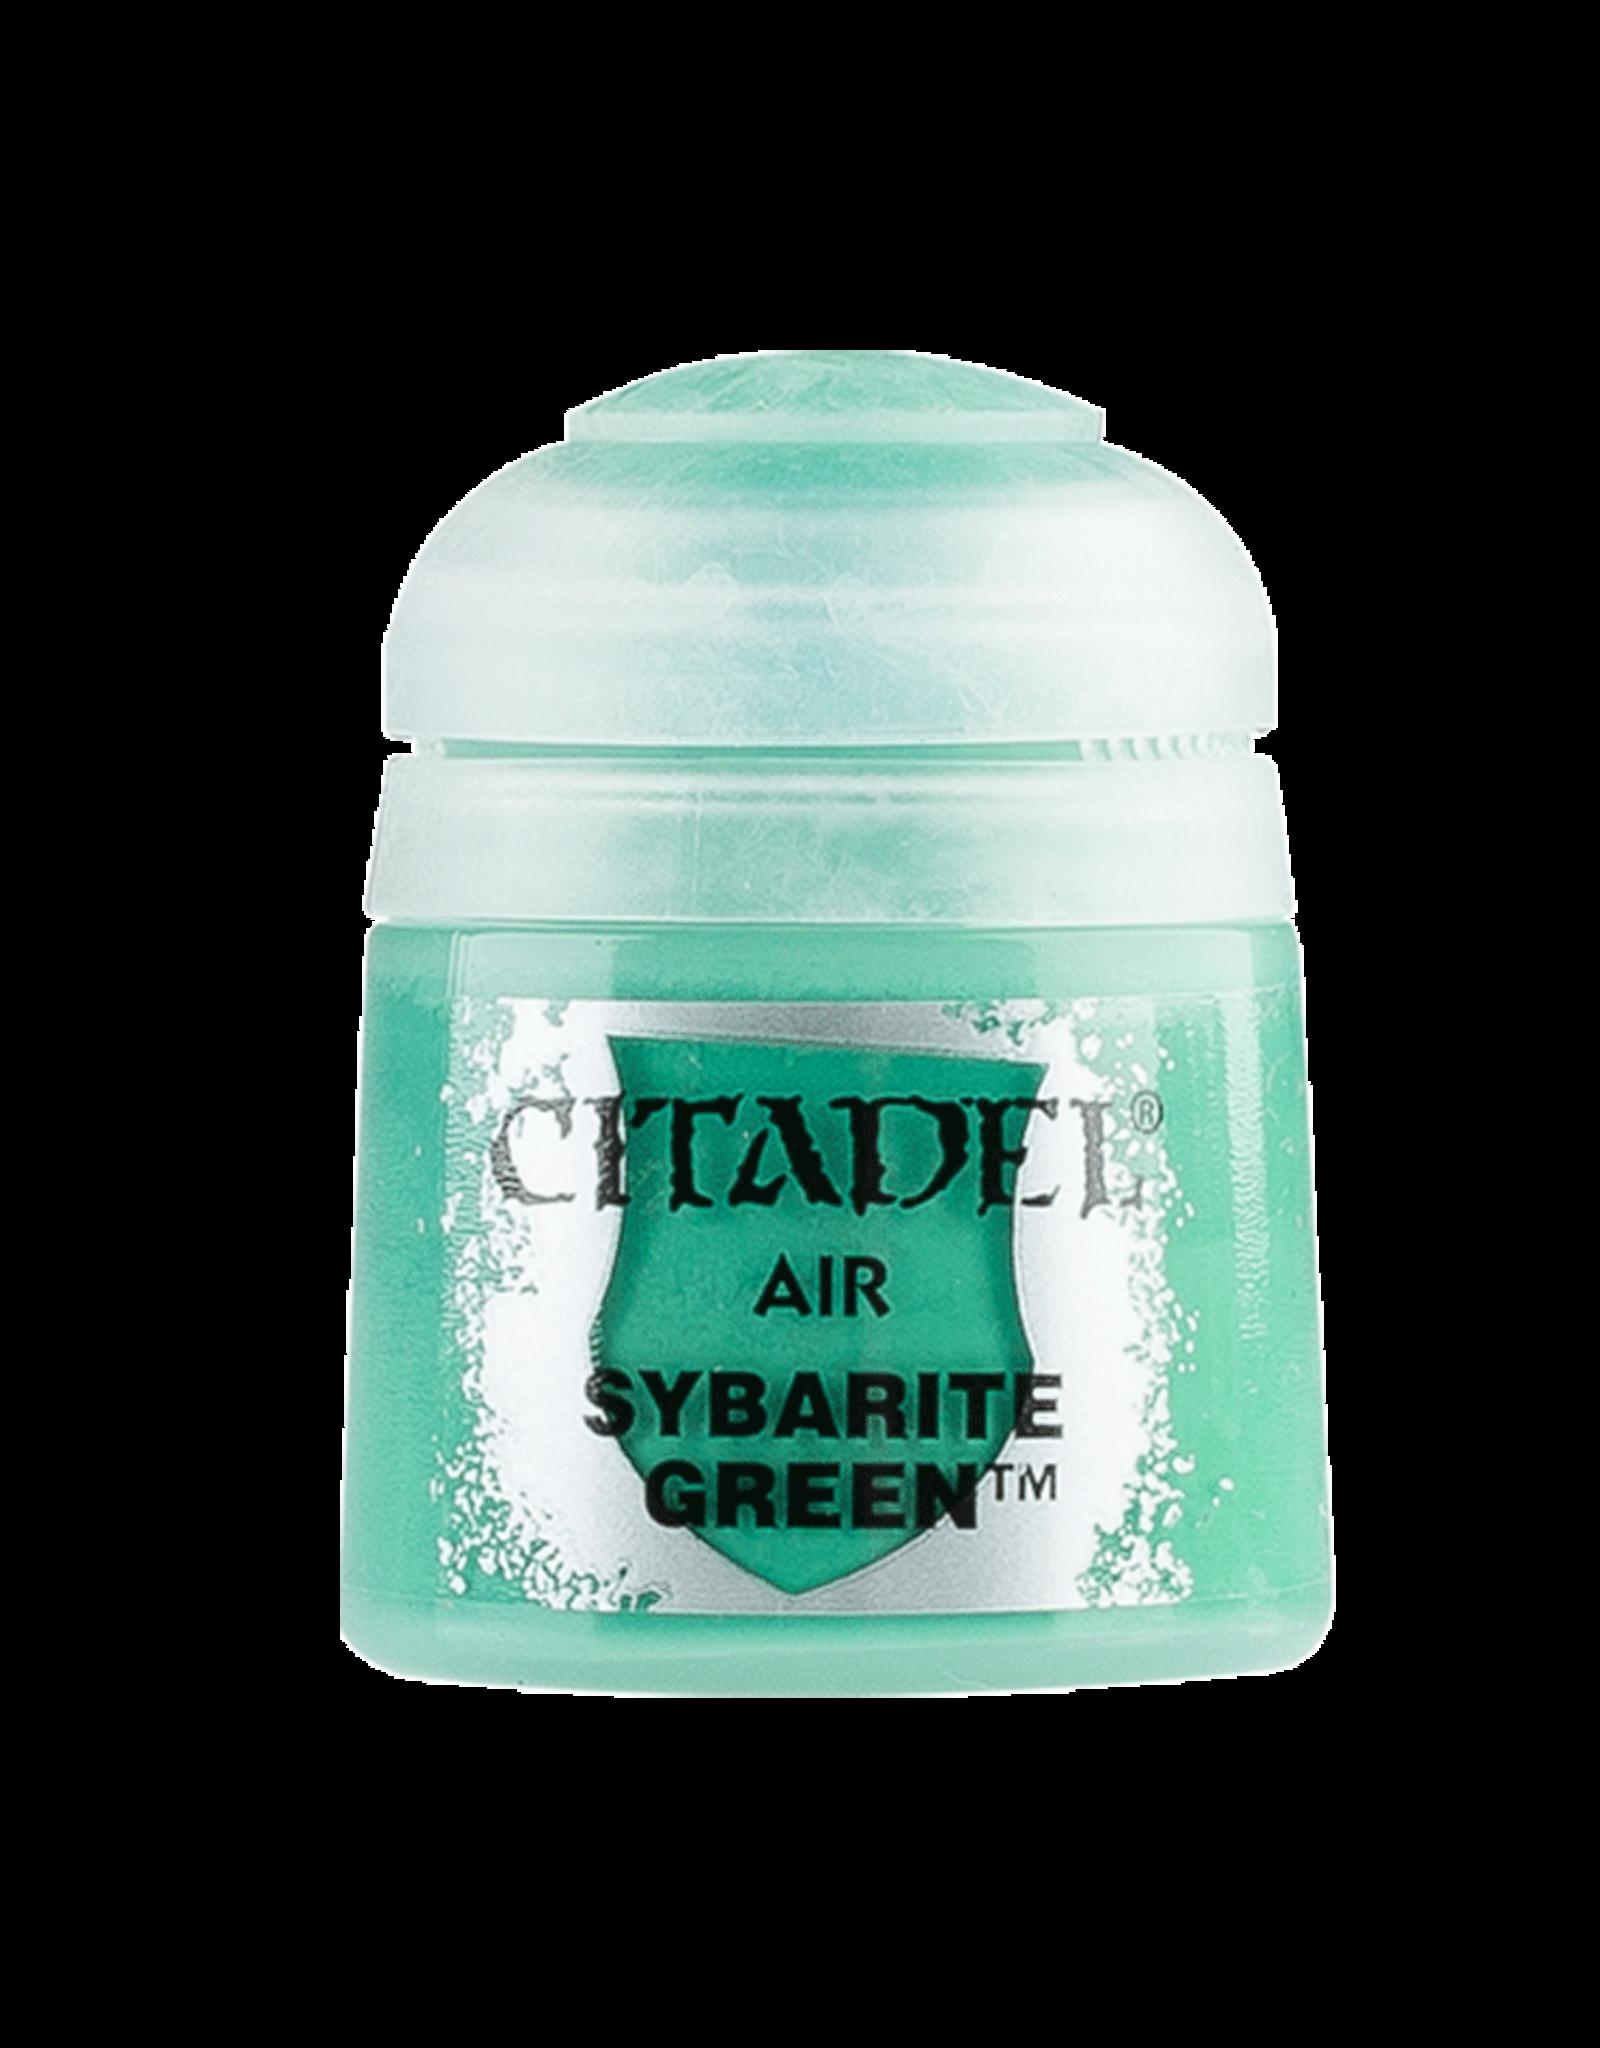 Citadel Citadel Air: Sybarite Green (24ml)